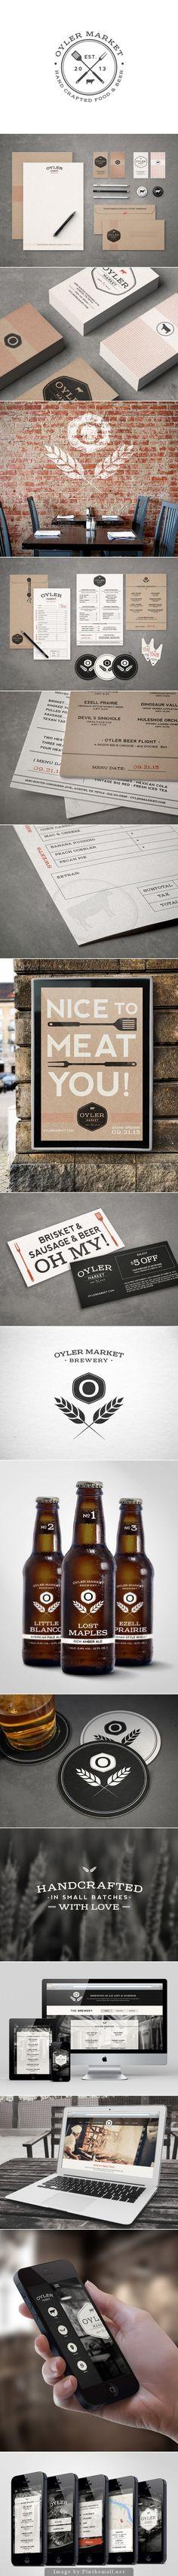 Oyler Market Mockup.